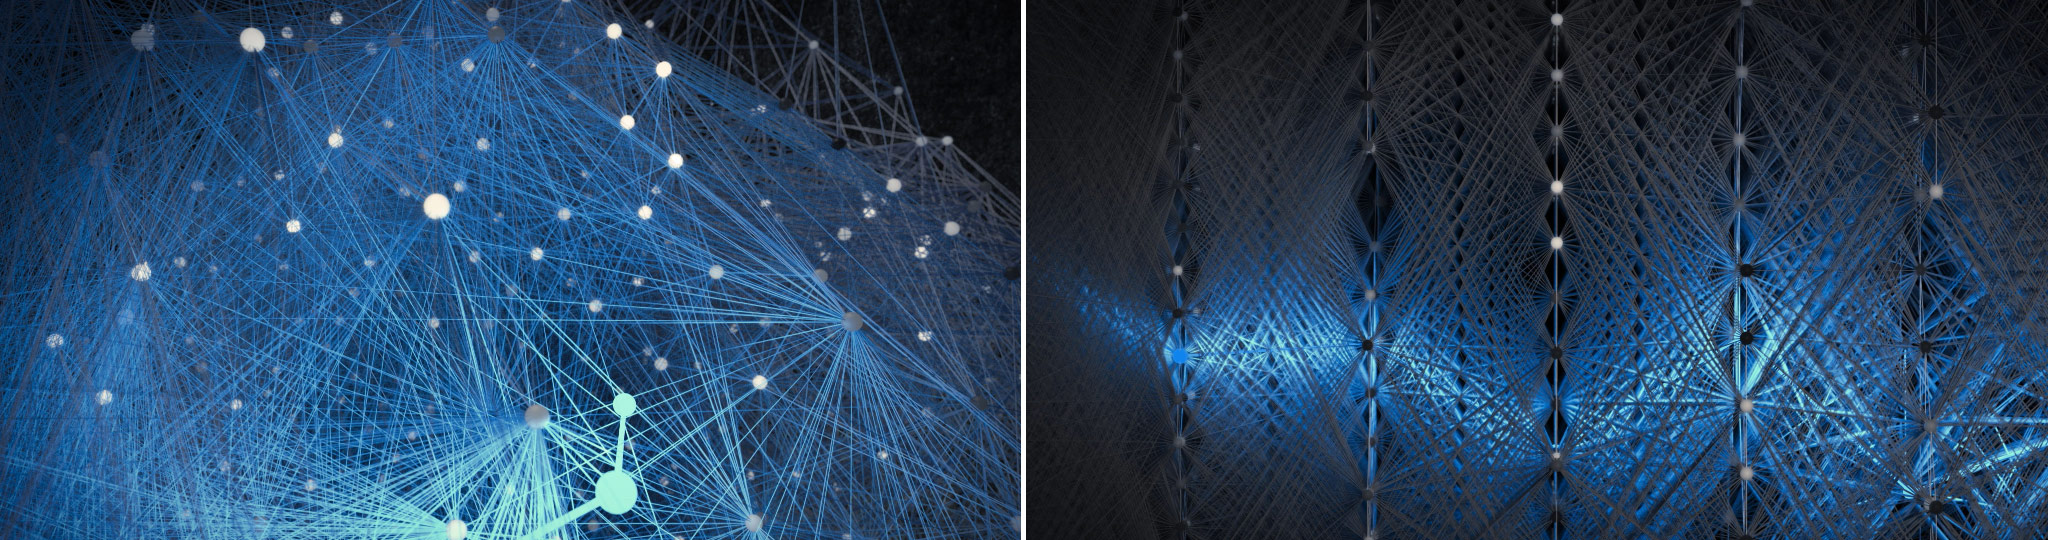 Inside The Neural Network